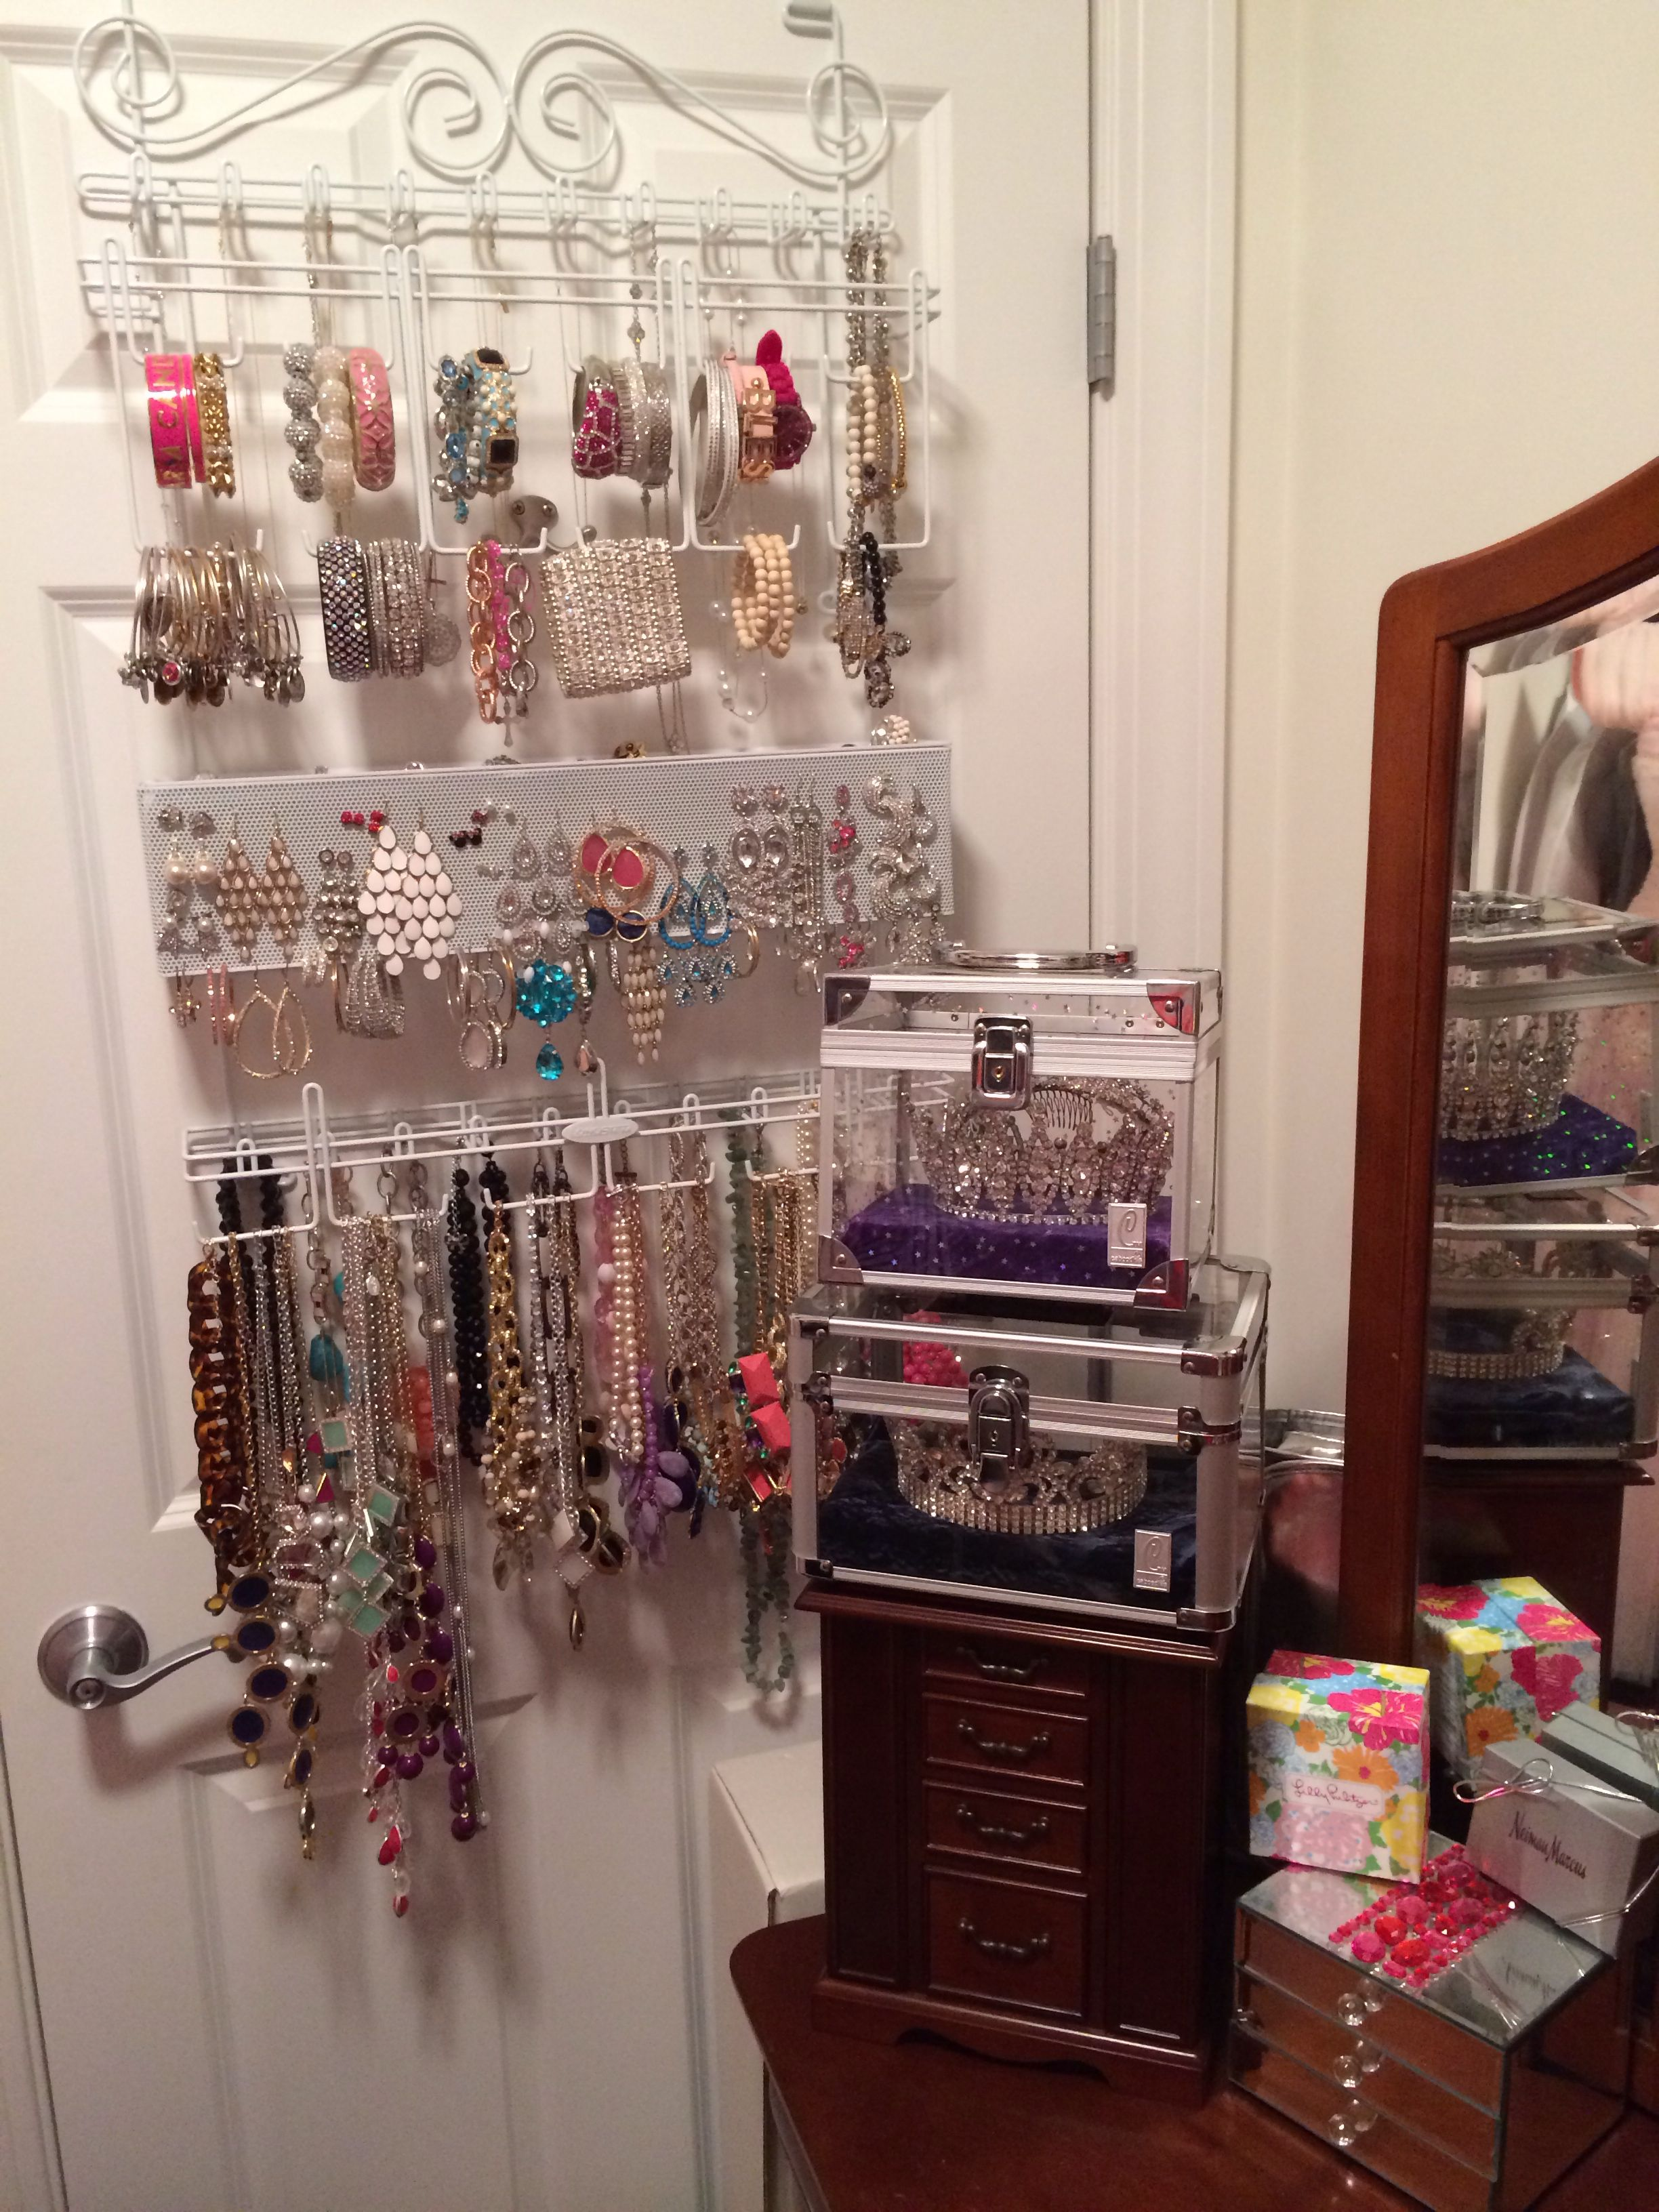 Over the door jewelry organizer in 2019 | Jewelry ...